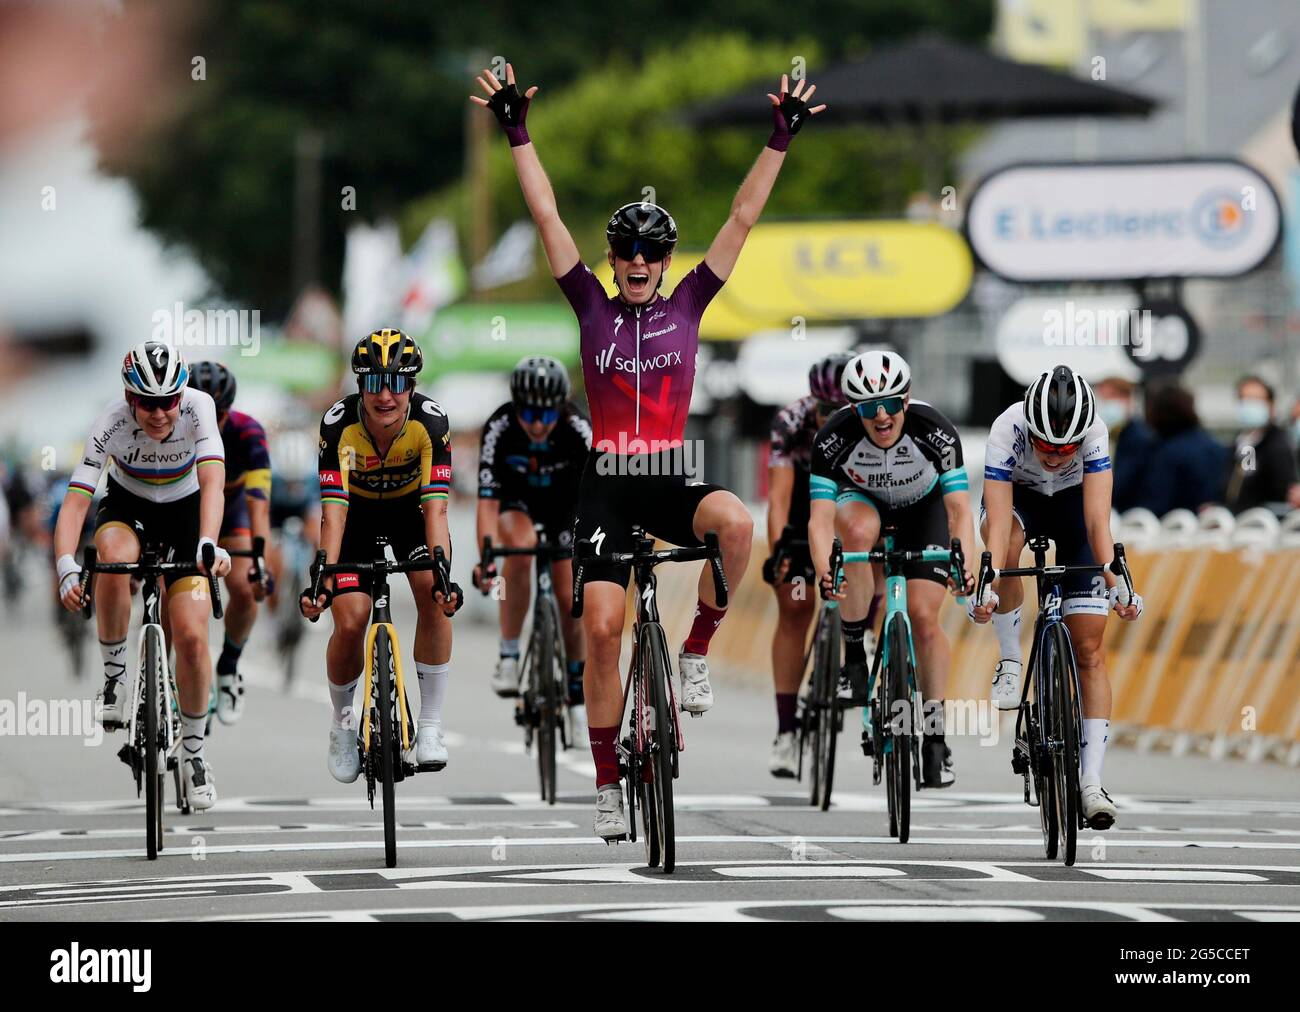 Ciclismo - la Course by Tour de France - Brest to Landerneau - France - June 26, 2021 Team SD Worx Women Cycling Team Demi Vollering festeggia dopo aver vinto il Stage Pool tramite REUTERS/Benoit Tessier Foto Stock